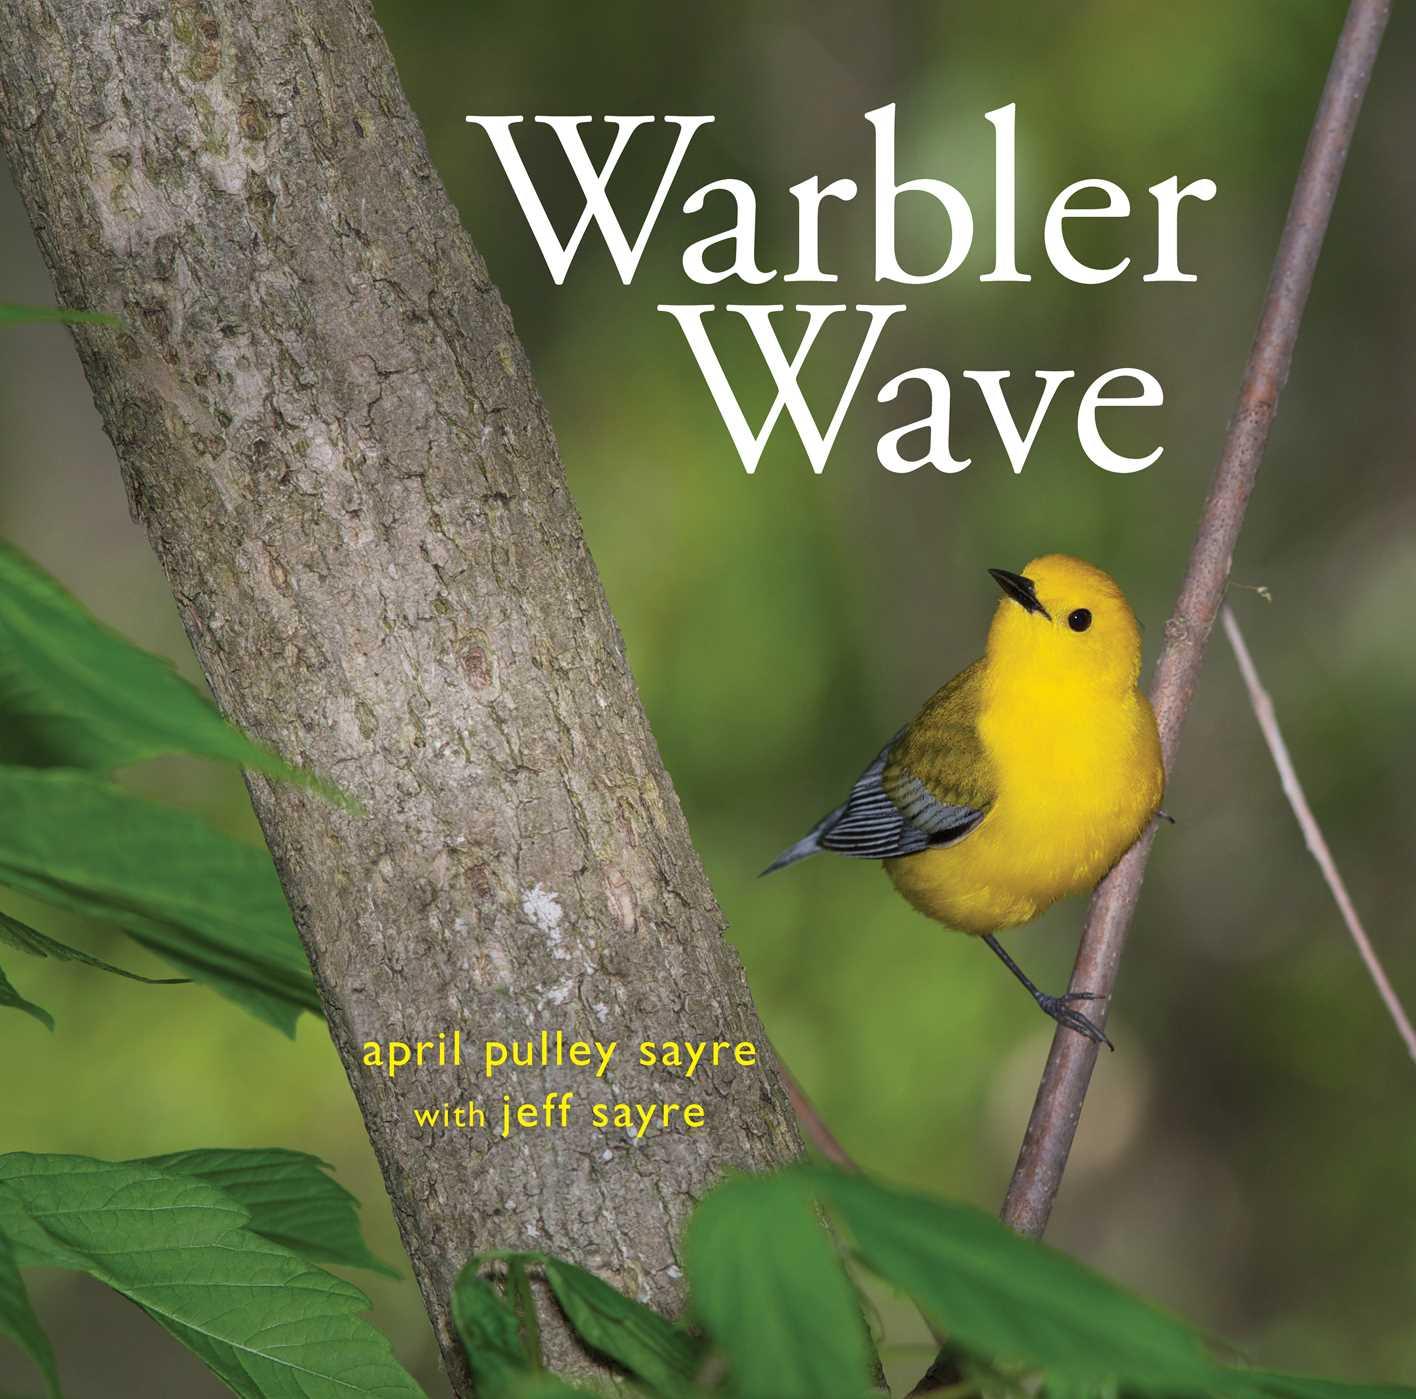 Warbler wave 9781481448291 hr